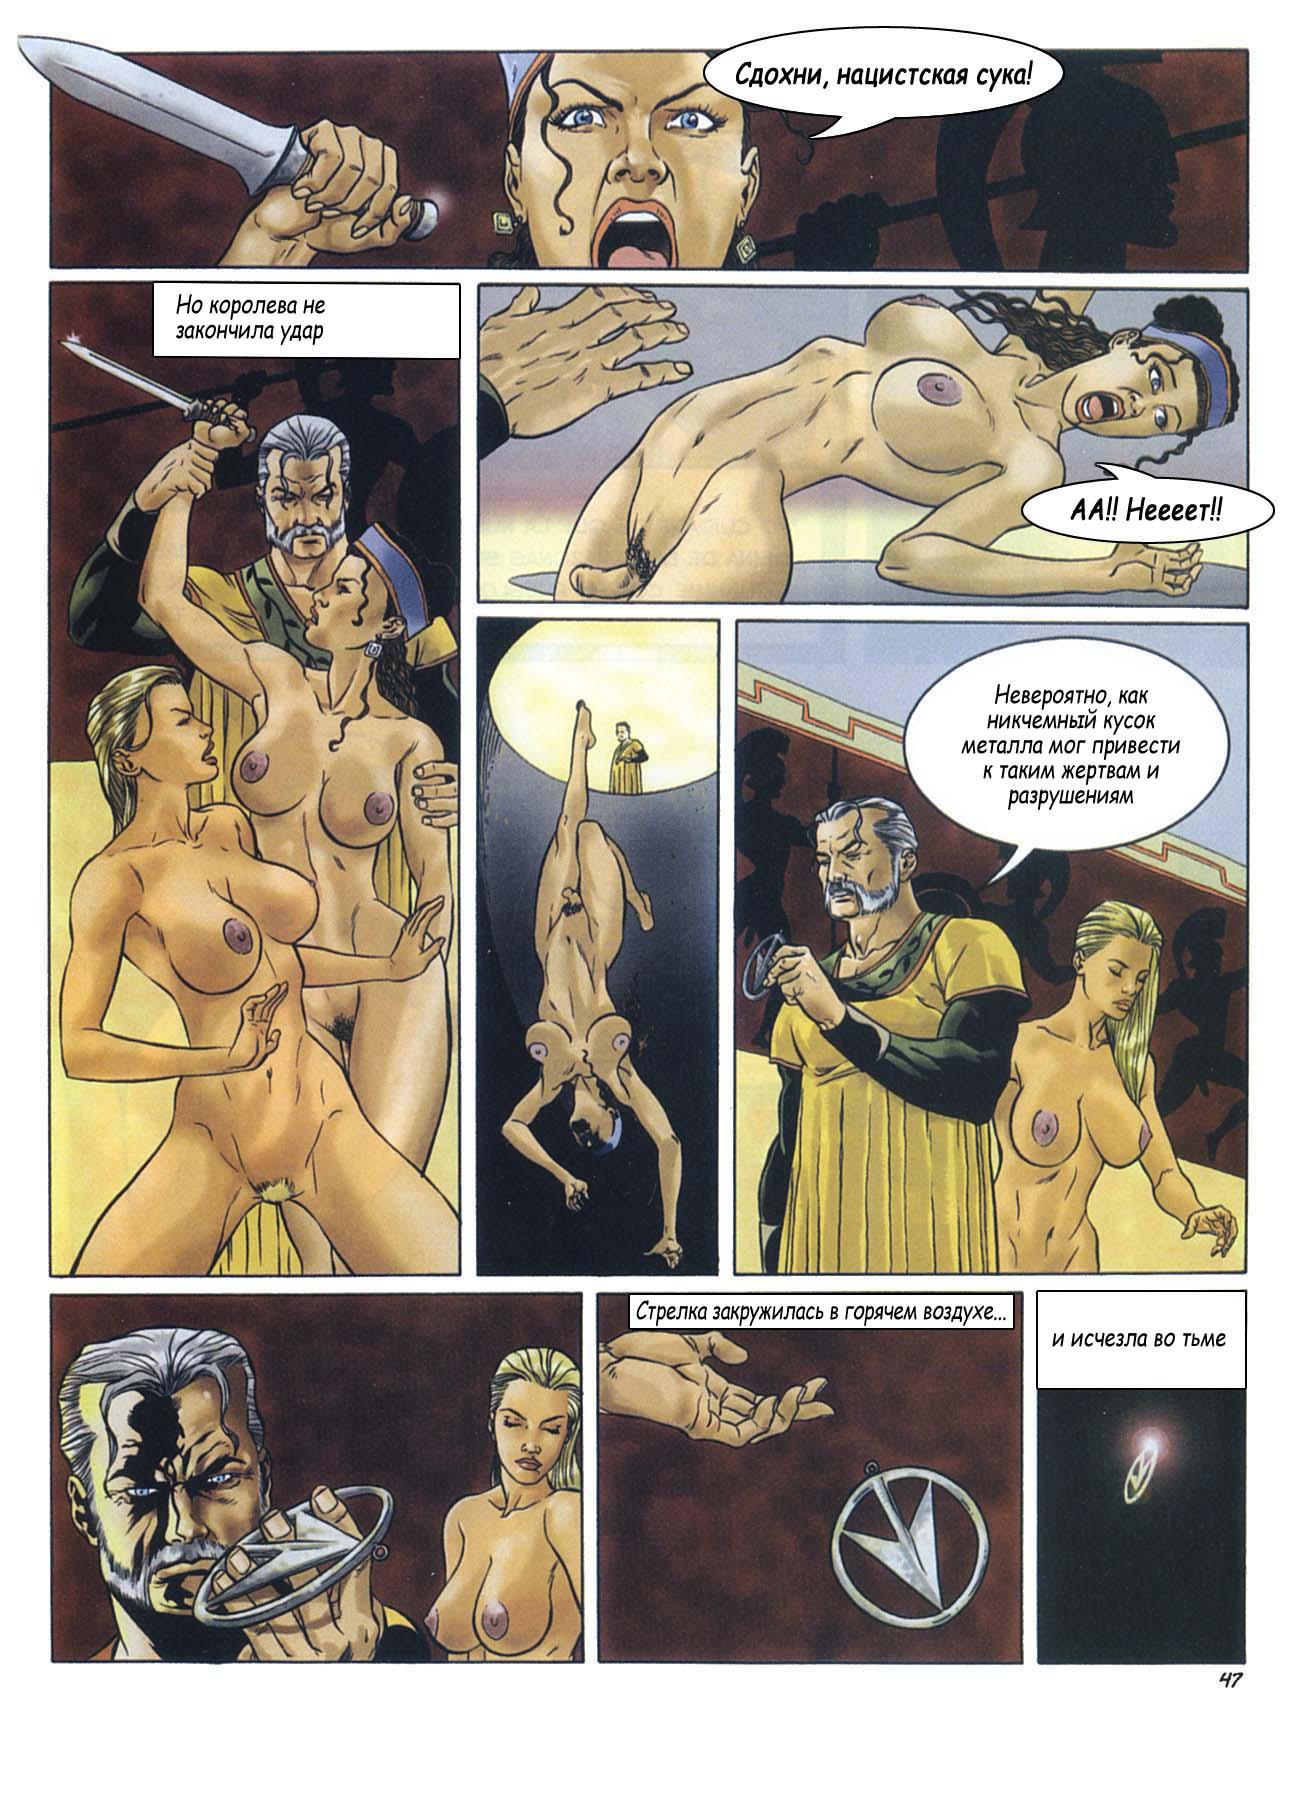 Gallery catoons amazona xxx naked movies